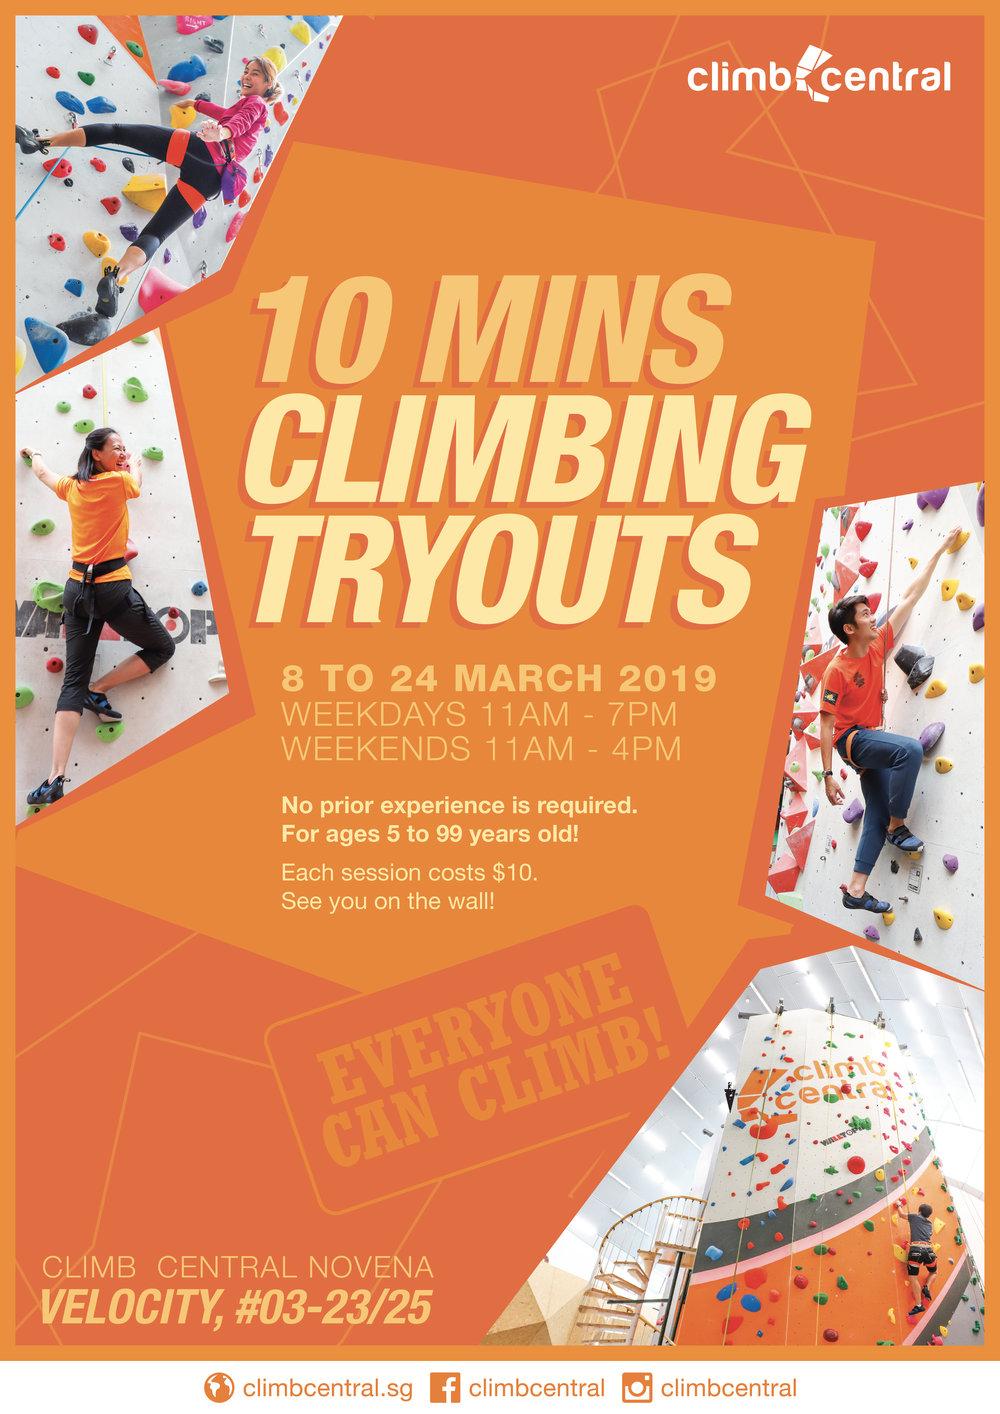 Climb Central Novena - 10 mins climbing tryouts